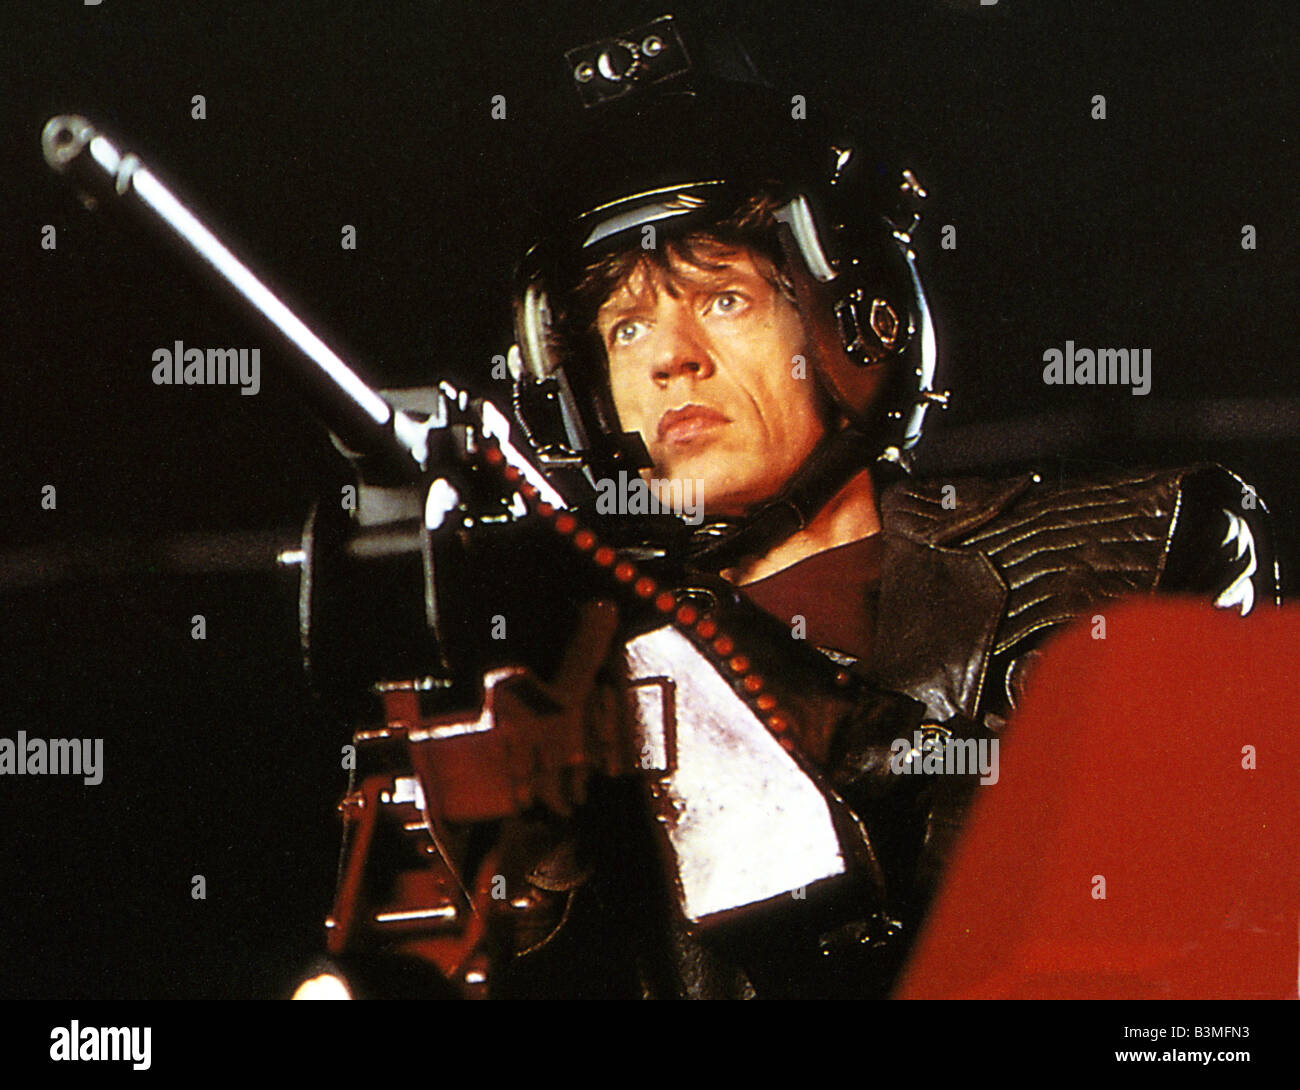 FREEJACK 1992 Warner/Morgan Creek film with Mick Jagger - Stock Image